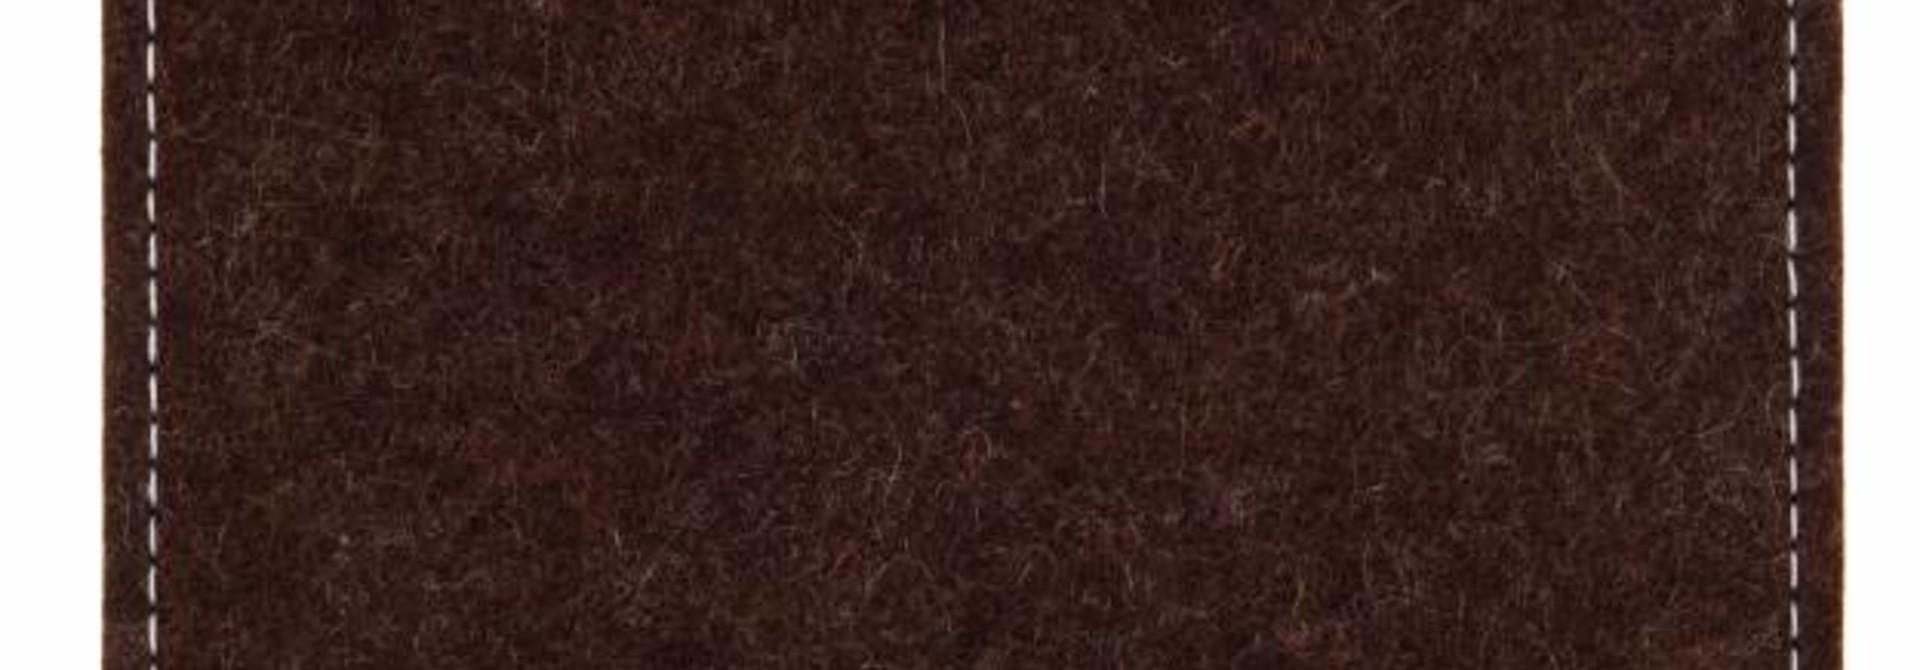 Kindle Fire Sleeve Truffle-Brown